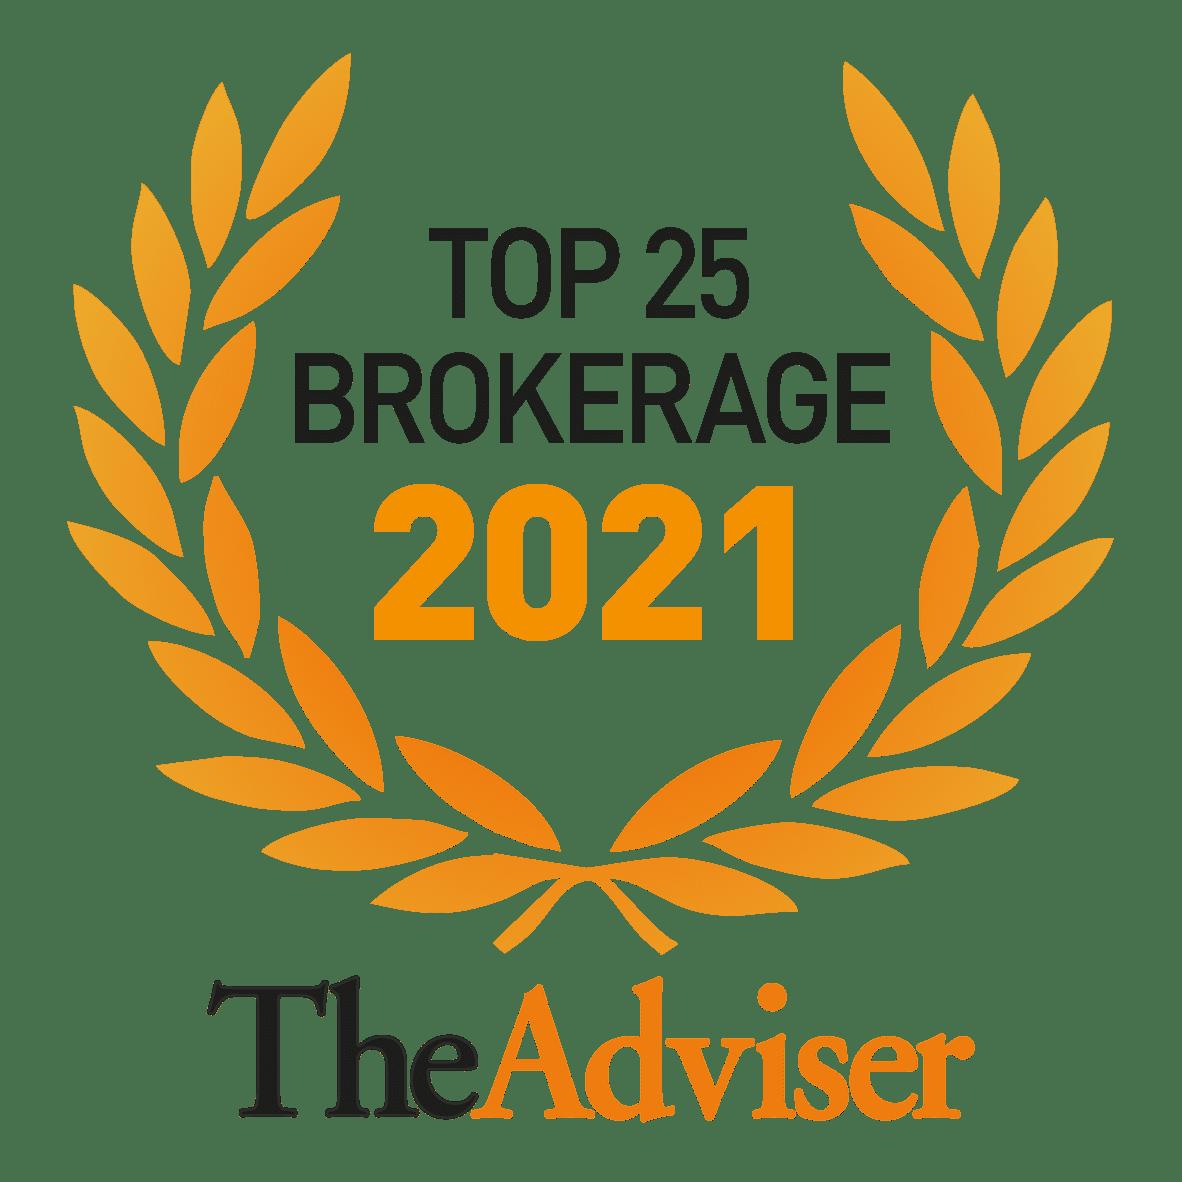 Top 25 Brokerage 2021